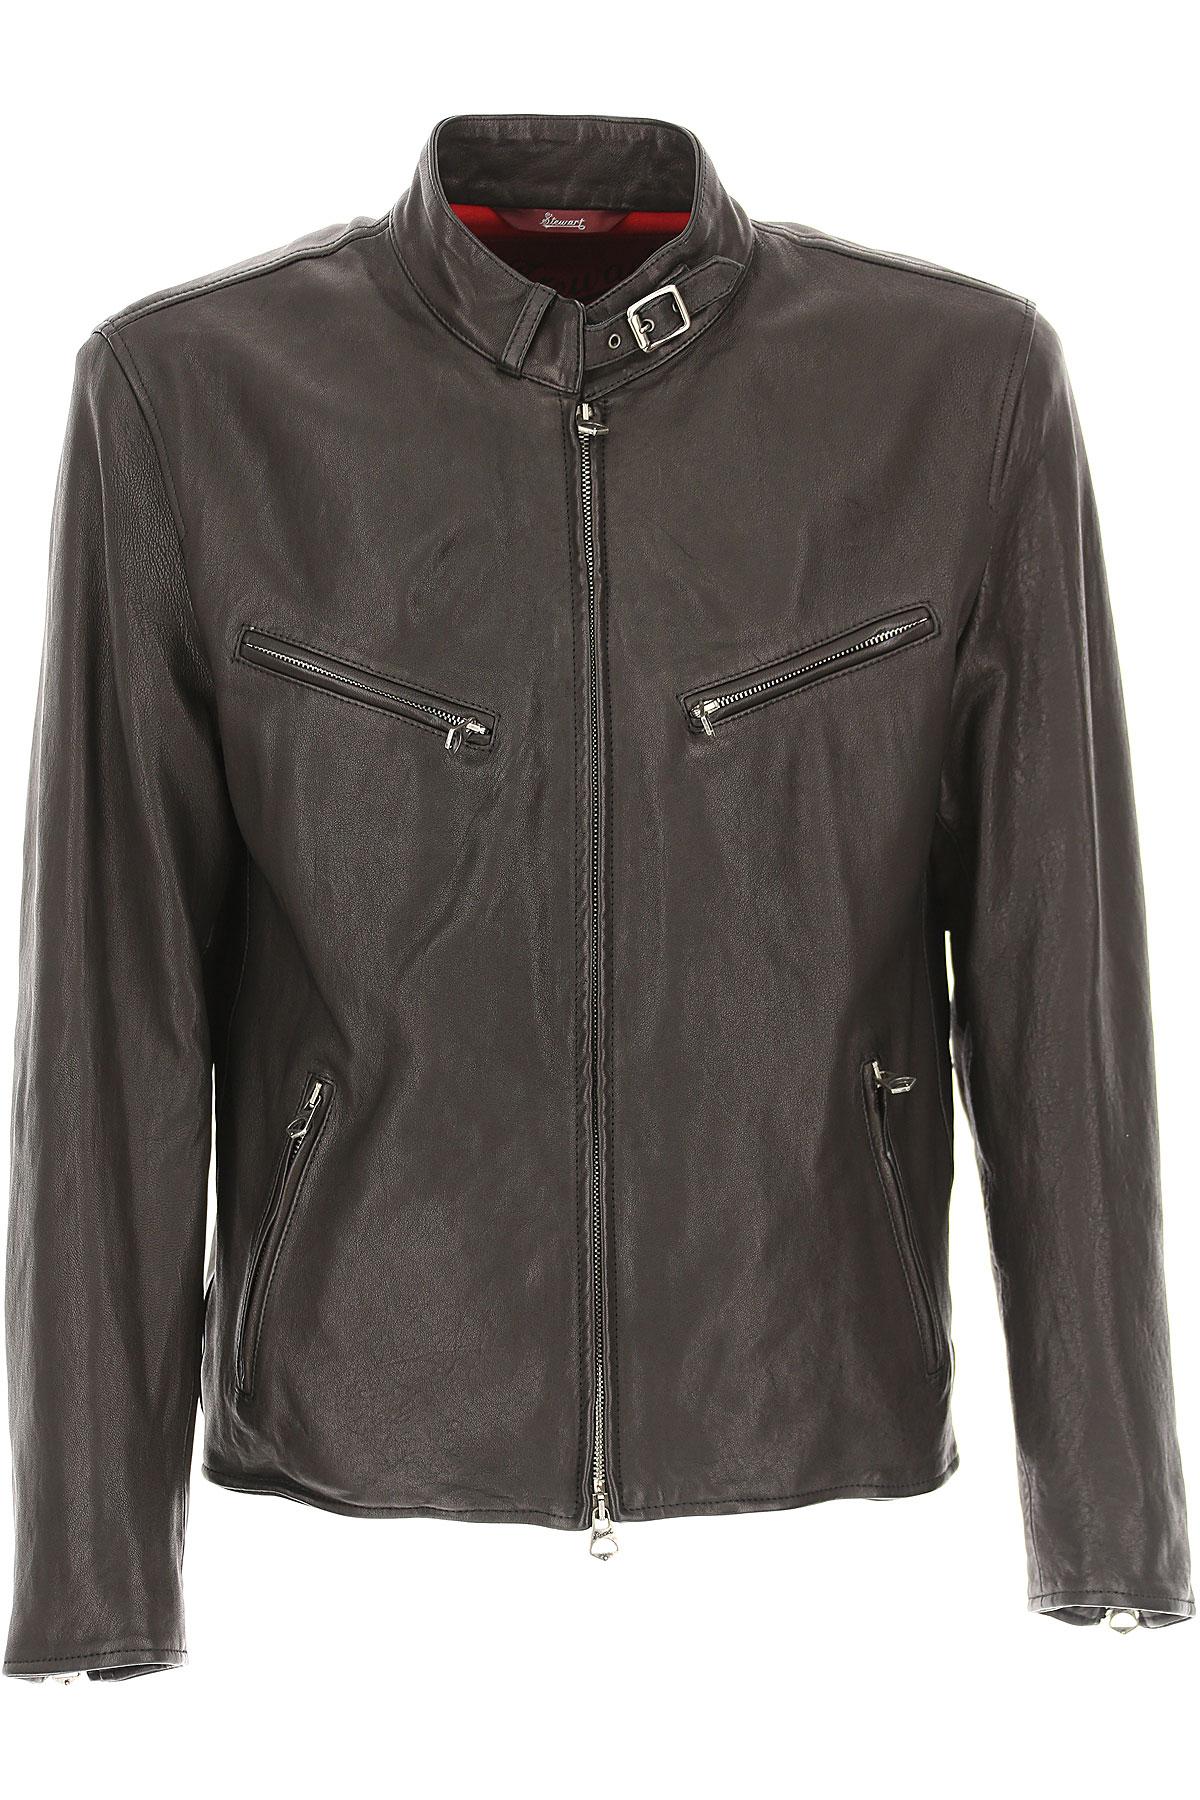 Image of Stewart Leather Jacket for Men, Dark Brown, Leather, 2017, L XL XXL